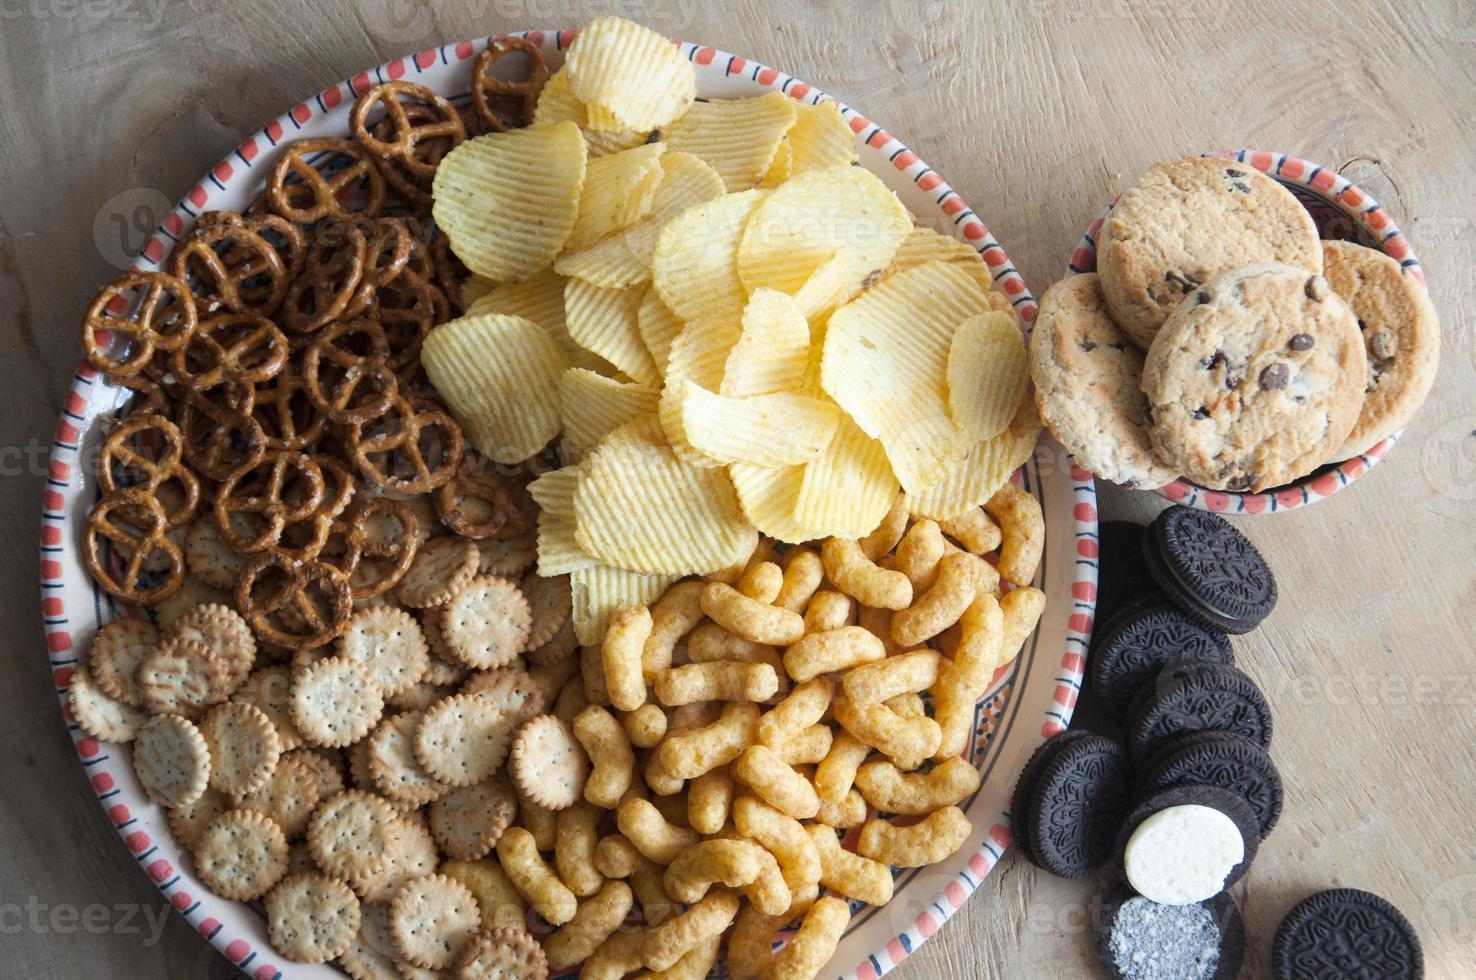 zoute snacks foto